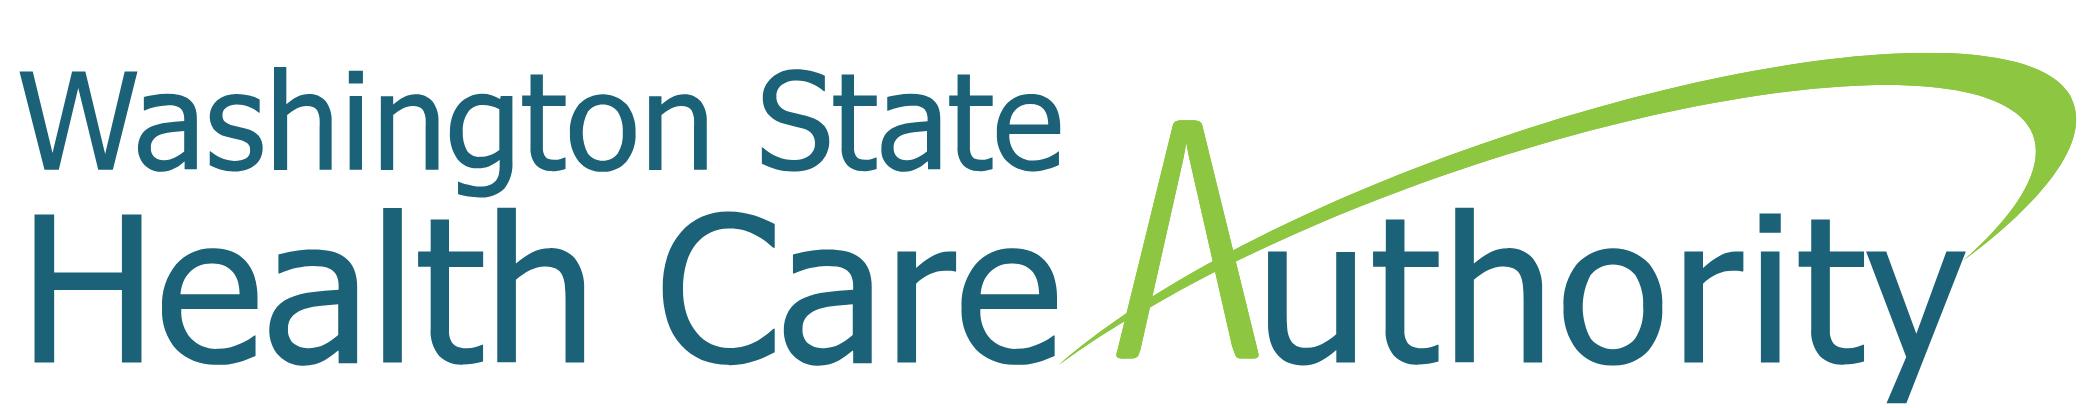 Washington State HCA logo